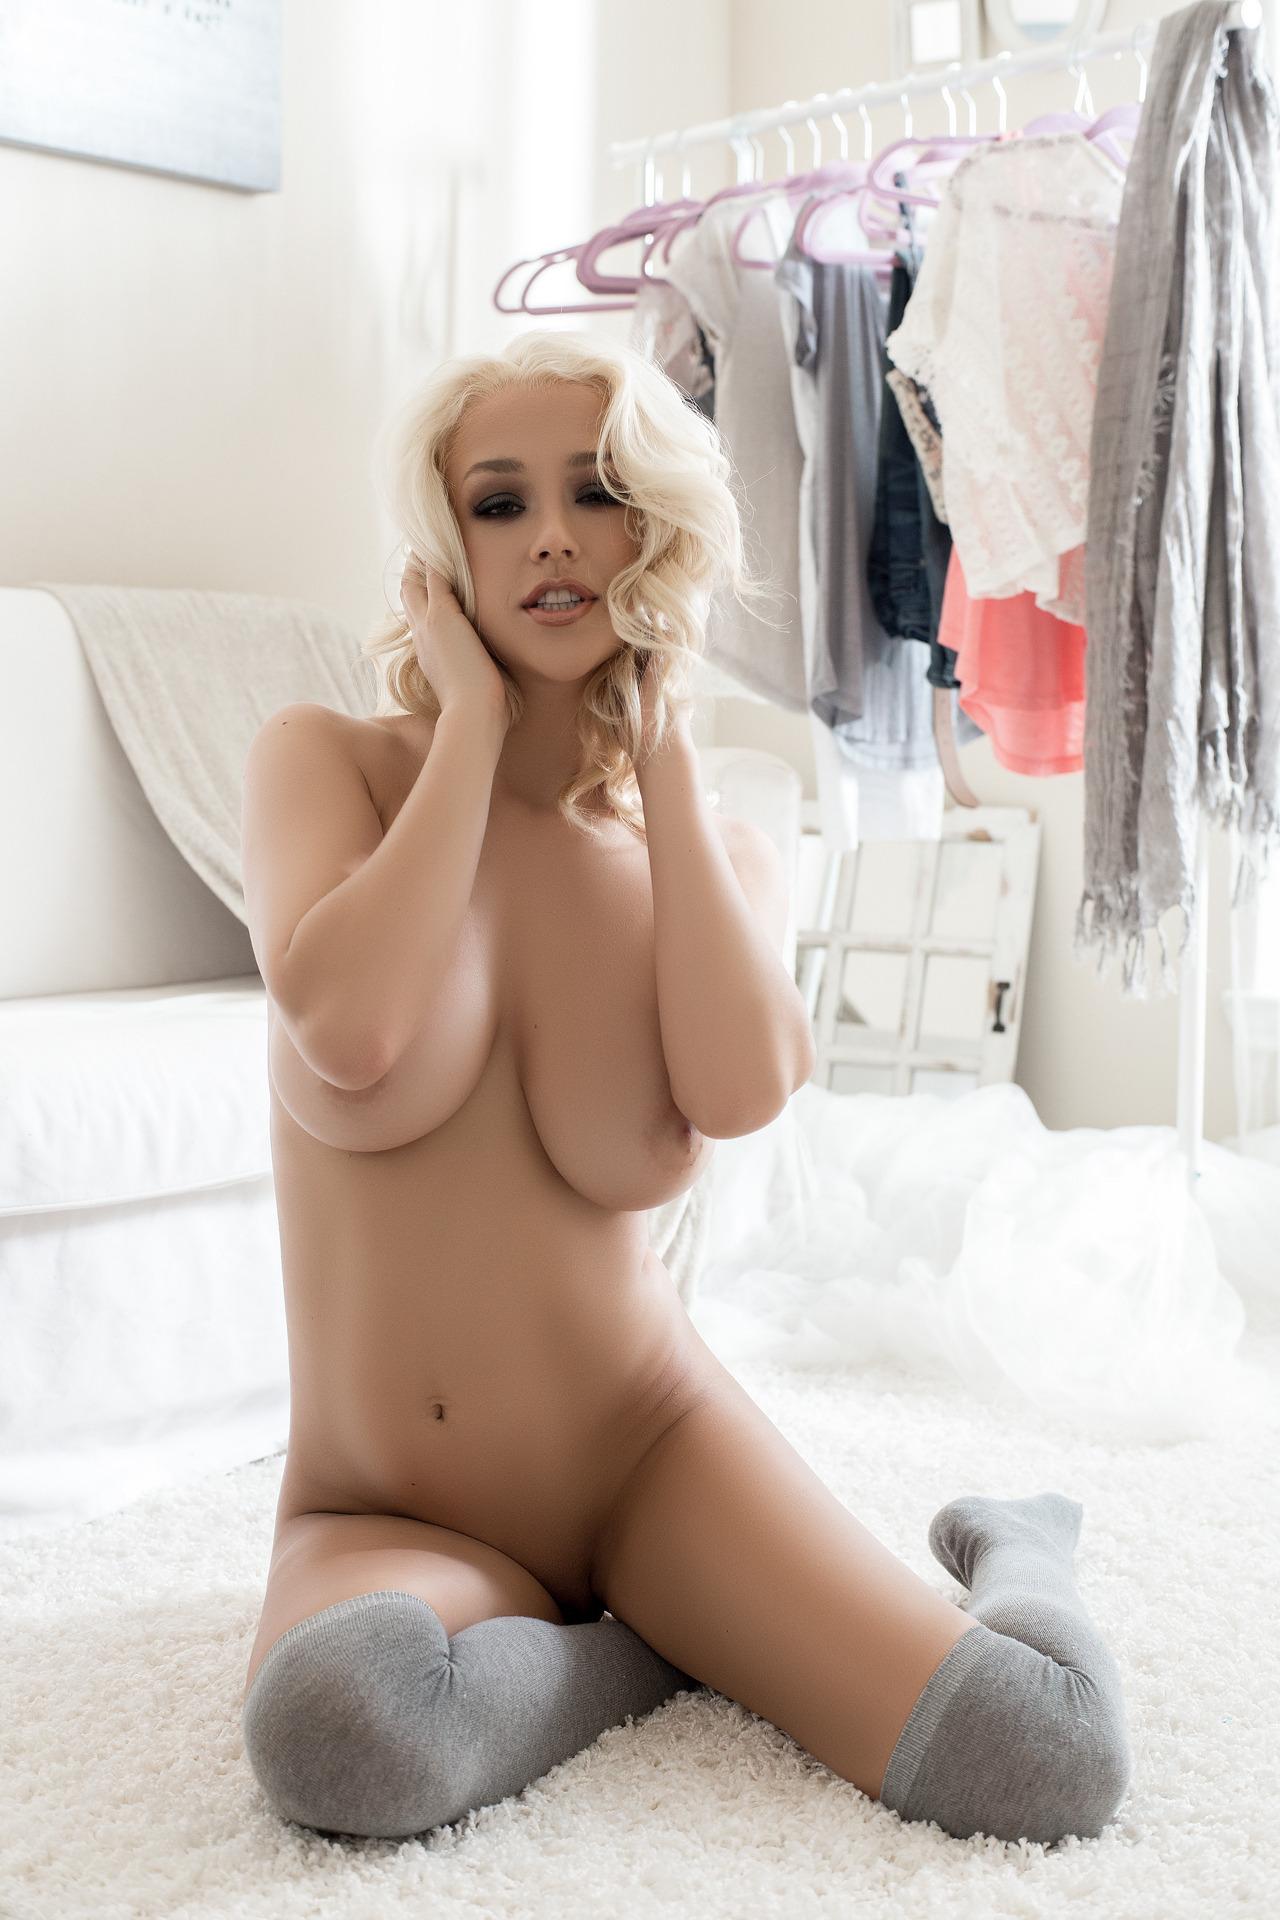 Lilii Mandy Kay Melissa Lolita Natasha Ty Sabrina Nichole